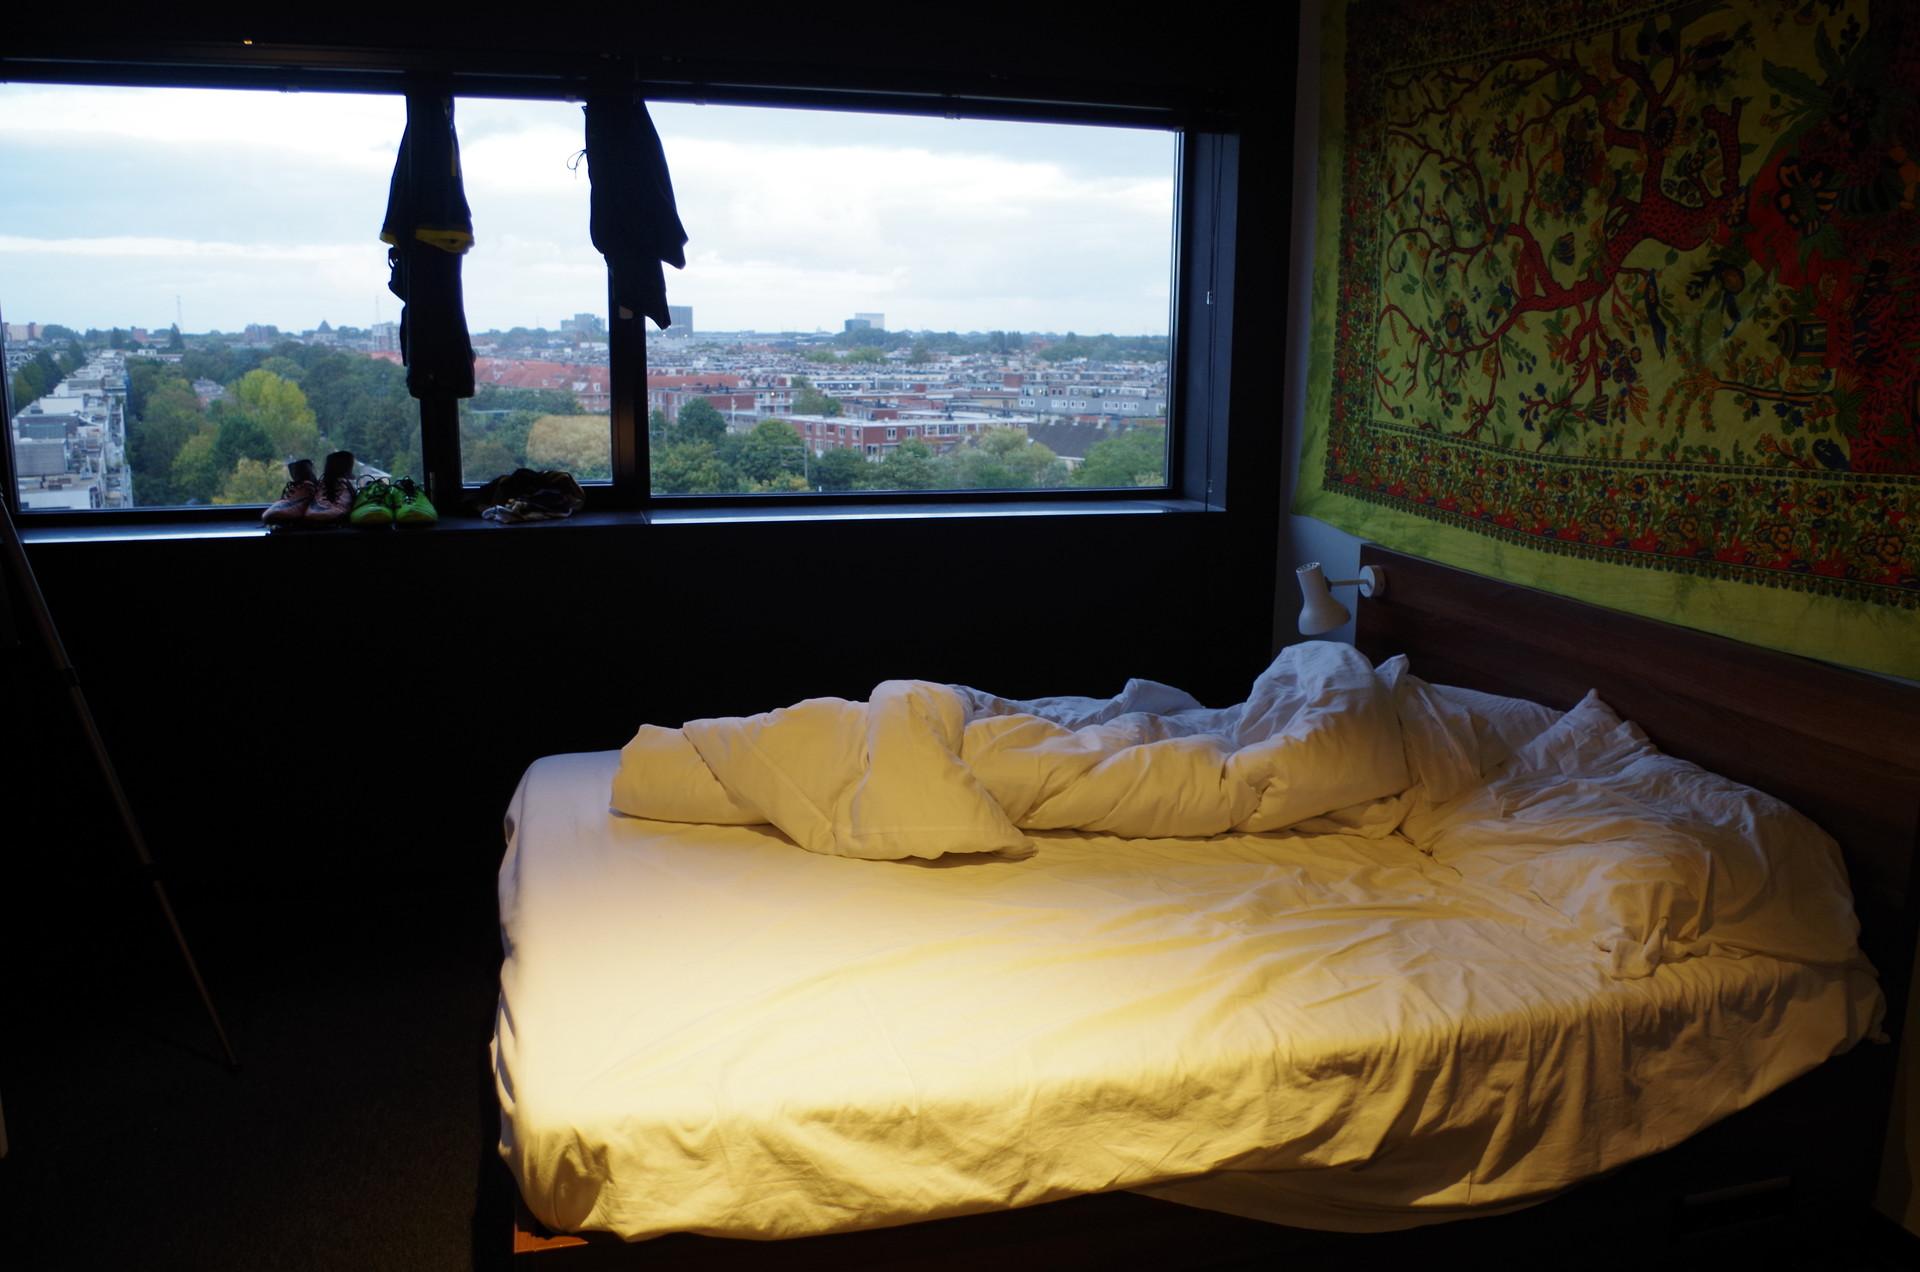 panorama-executive-the-student-hotel-amsterdam-city-7119c7d13670b2ed1cfa28777026b8d5